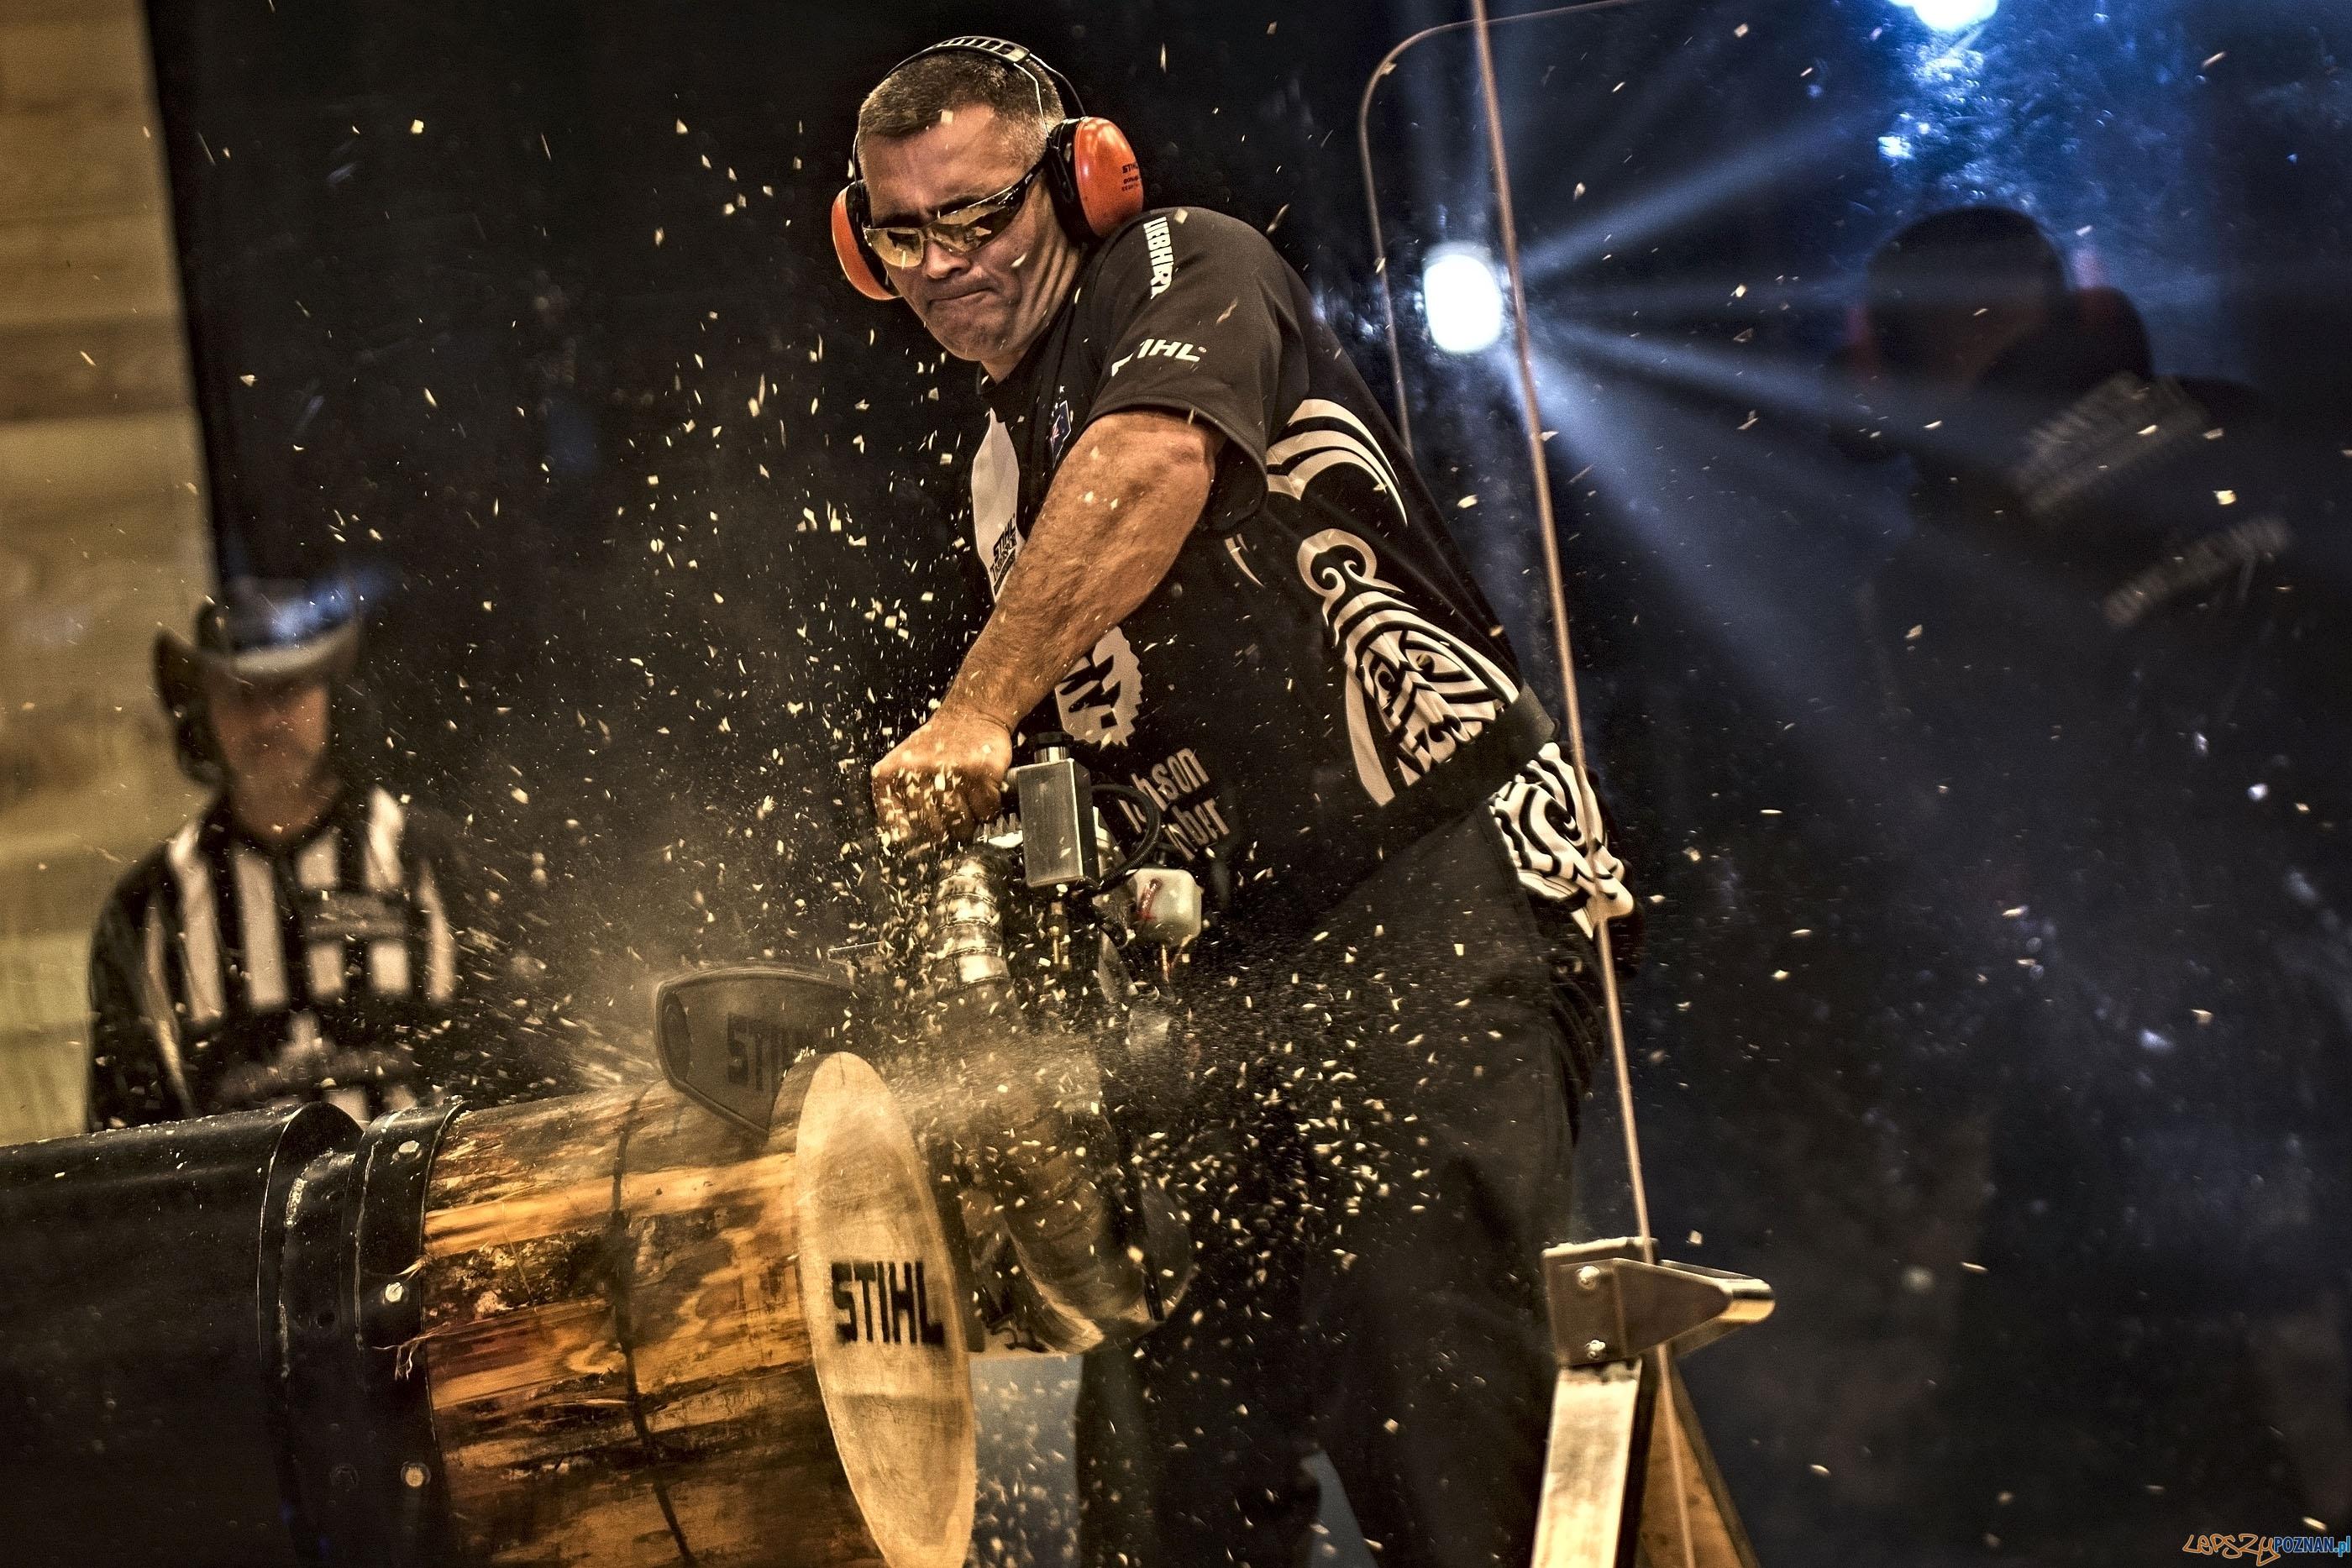 Jason Wynyard reprezentant Nowej Zealand w finale Stihl Timbersports World Championships 15 listopada 2014  Foto: Sebastian Marko for Limex Images / TimberSports